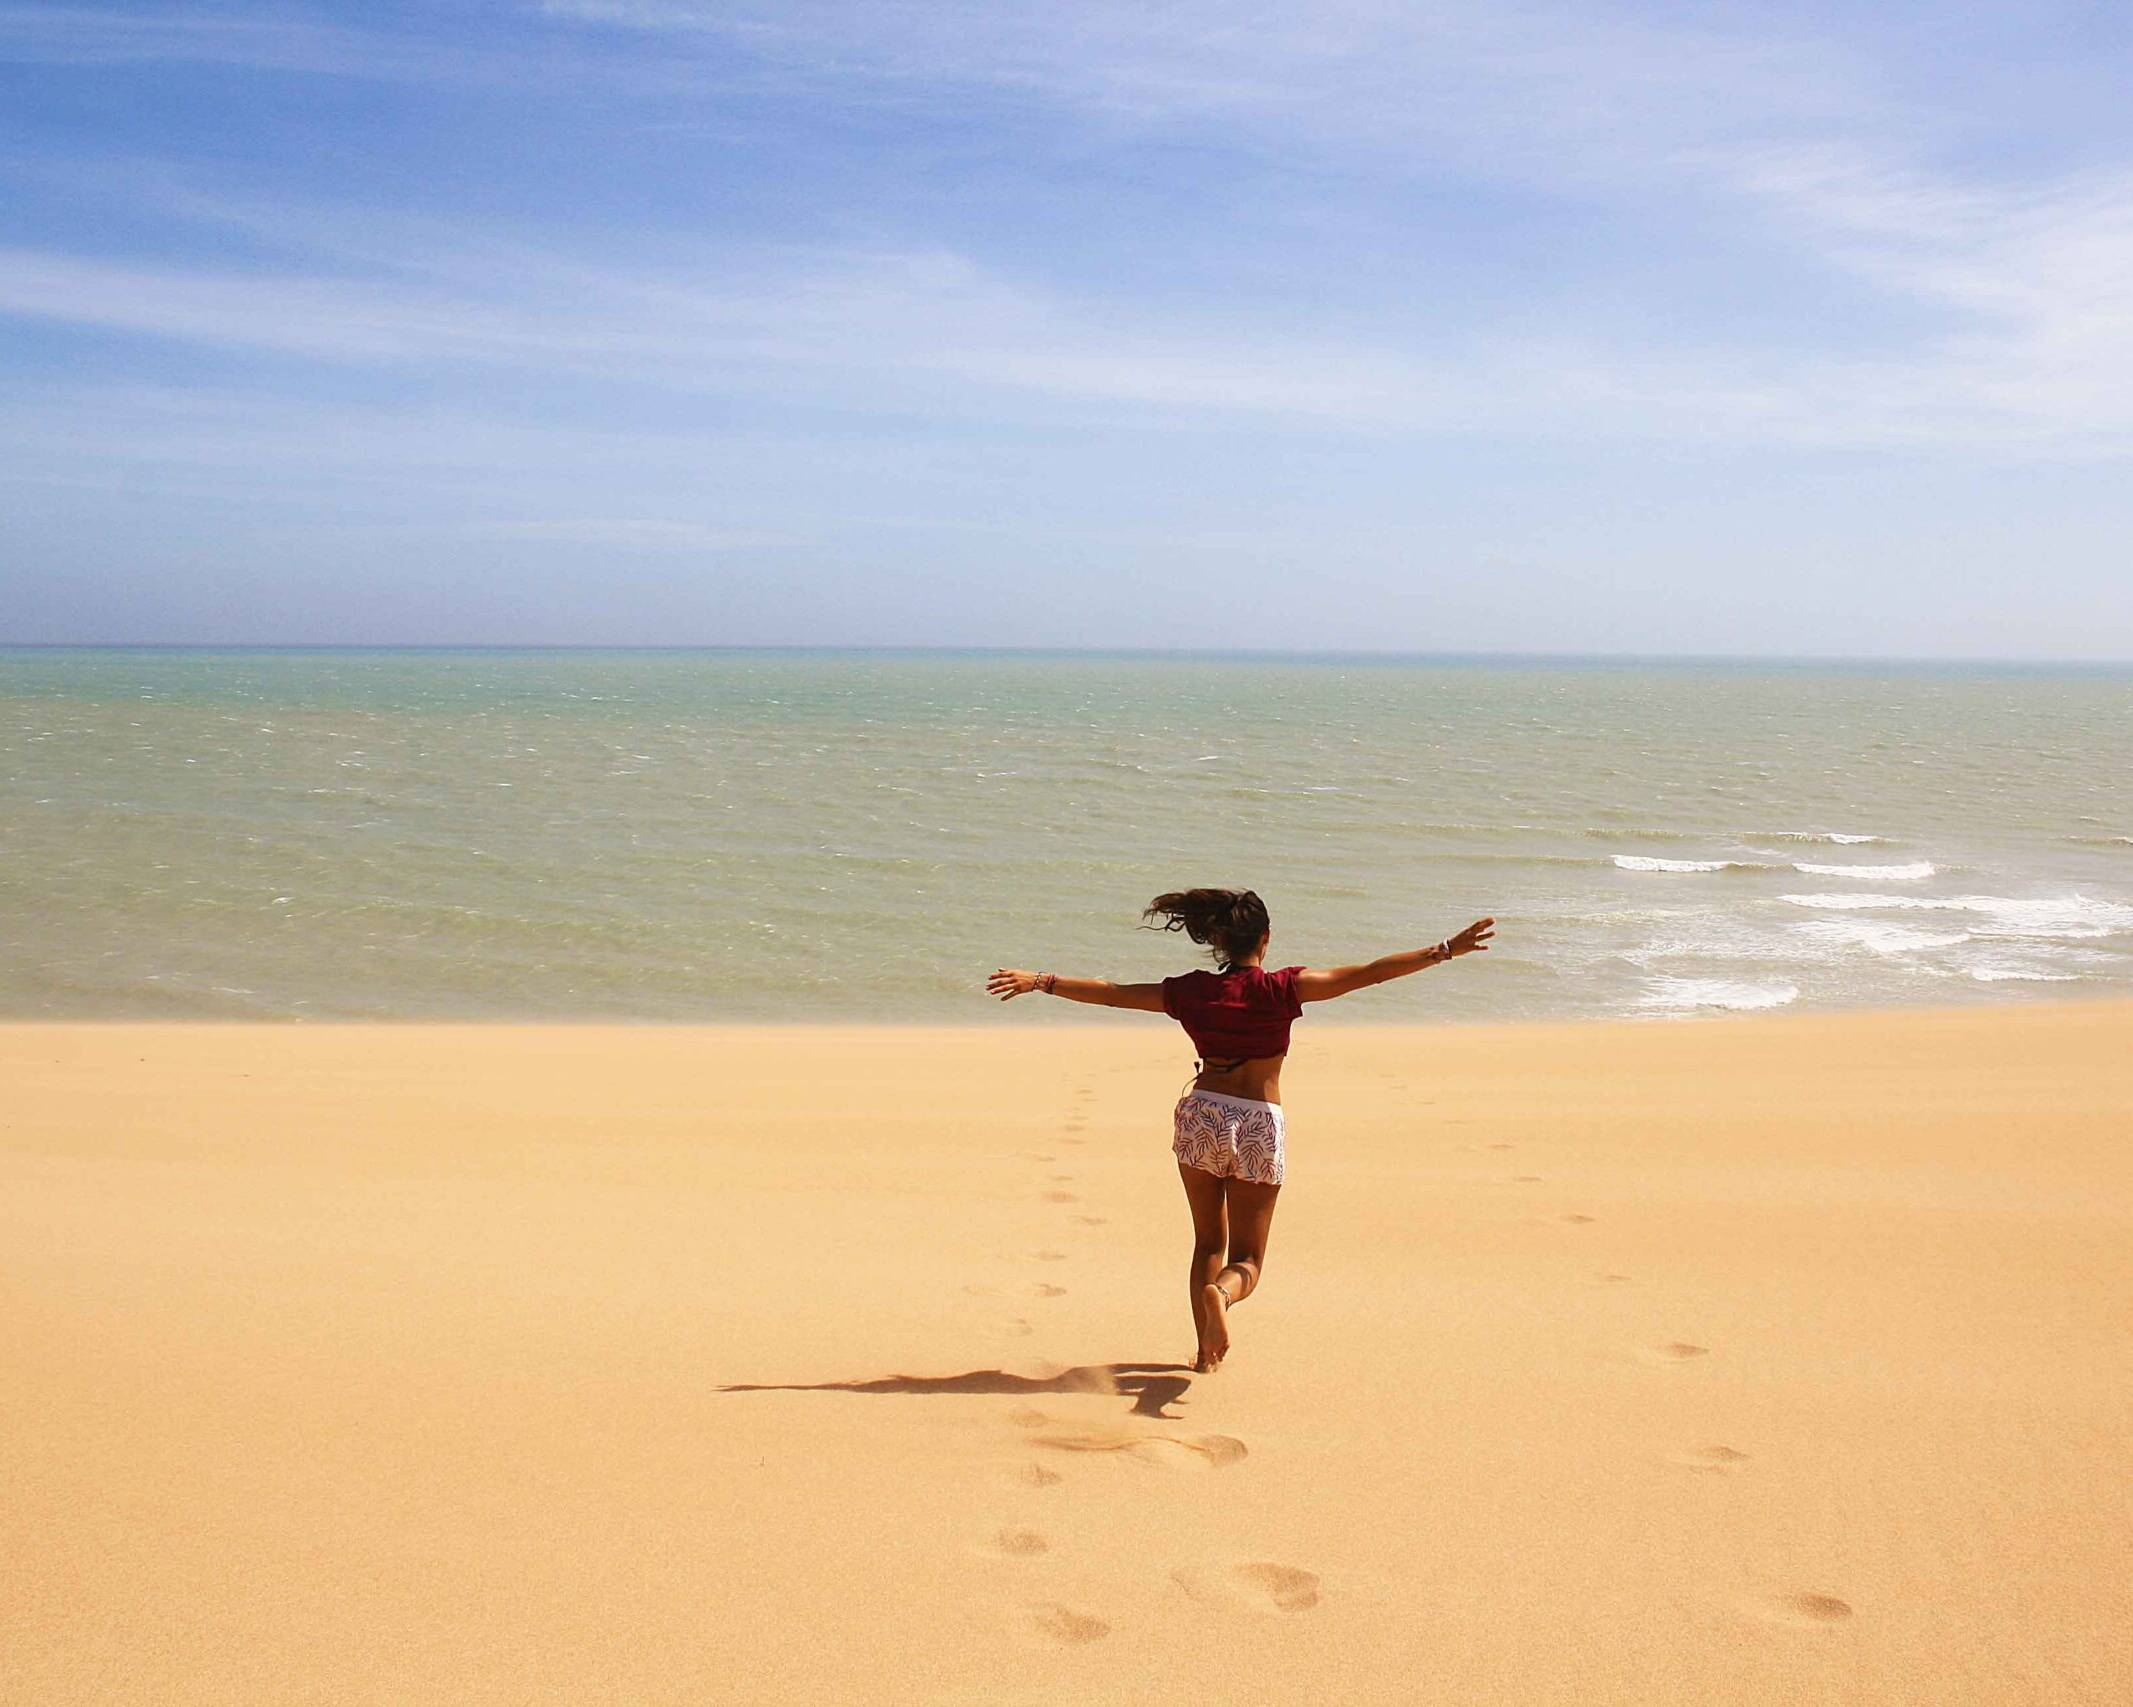 running in the desert dunes of Punta Gallinas Colombia